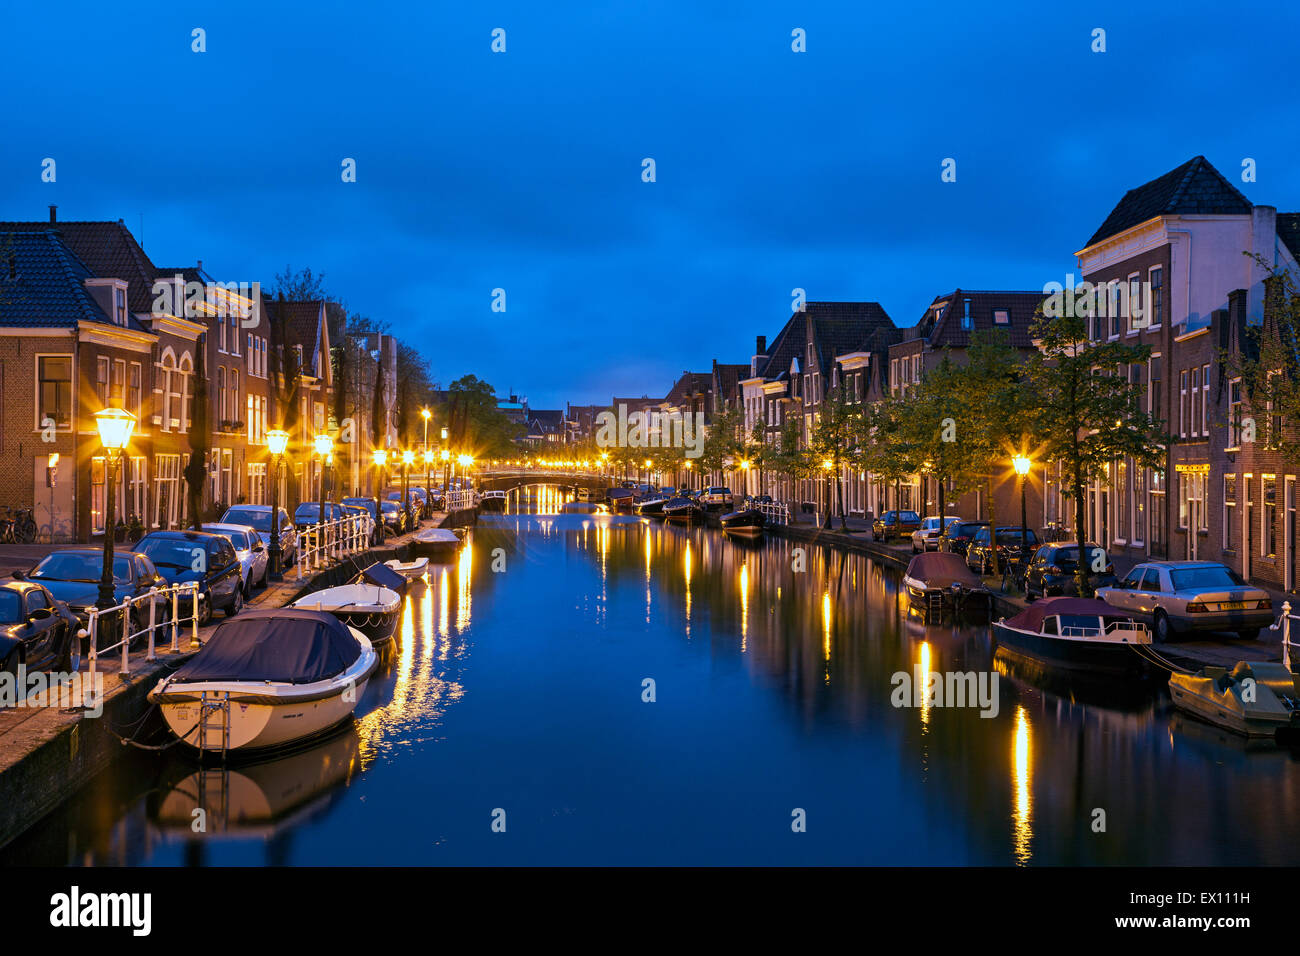 Case, barche canal, Leiden, Olanda, Paesi Bassi Immagini Stock